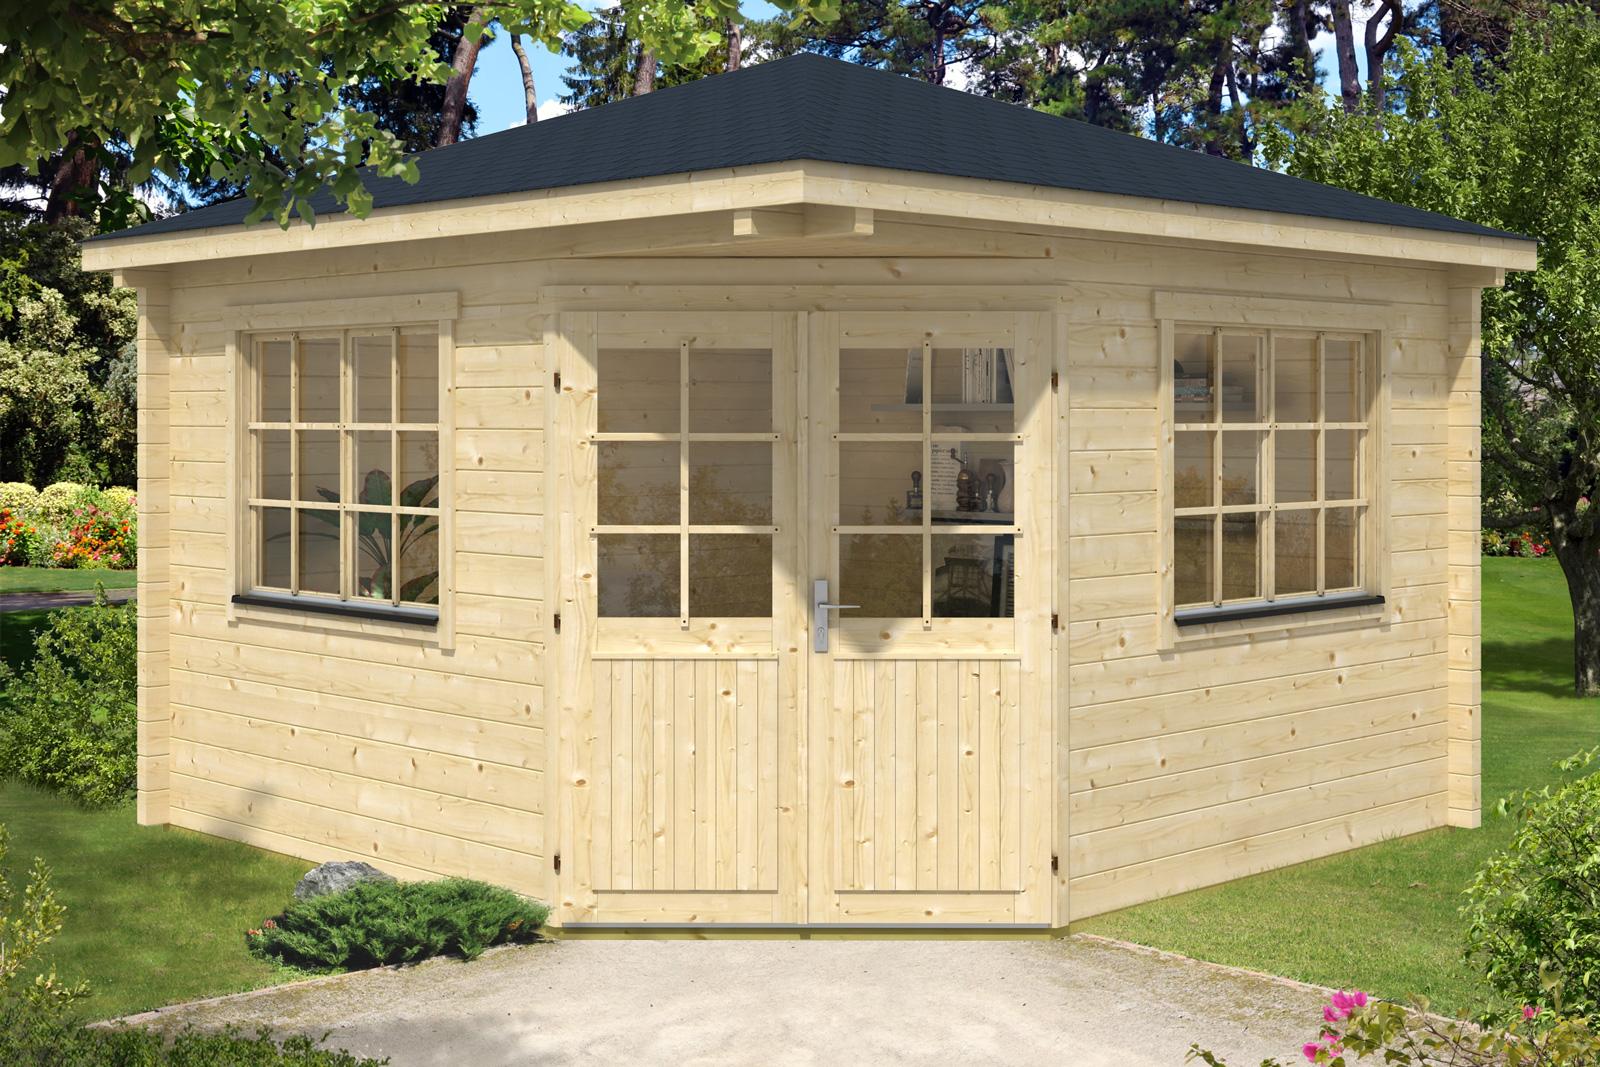 5 eck gartenhaus modell fabio 70. Black Bedroom Furniture Sets. Home Design Ideas